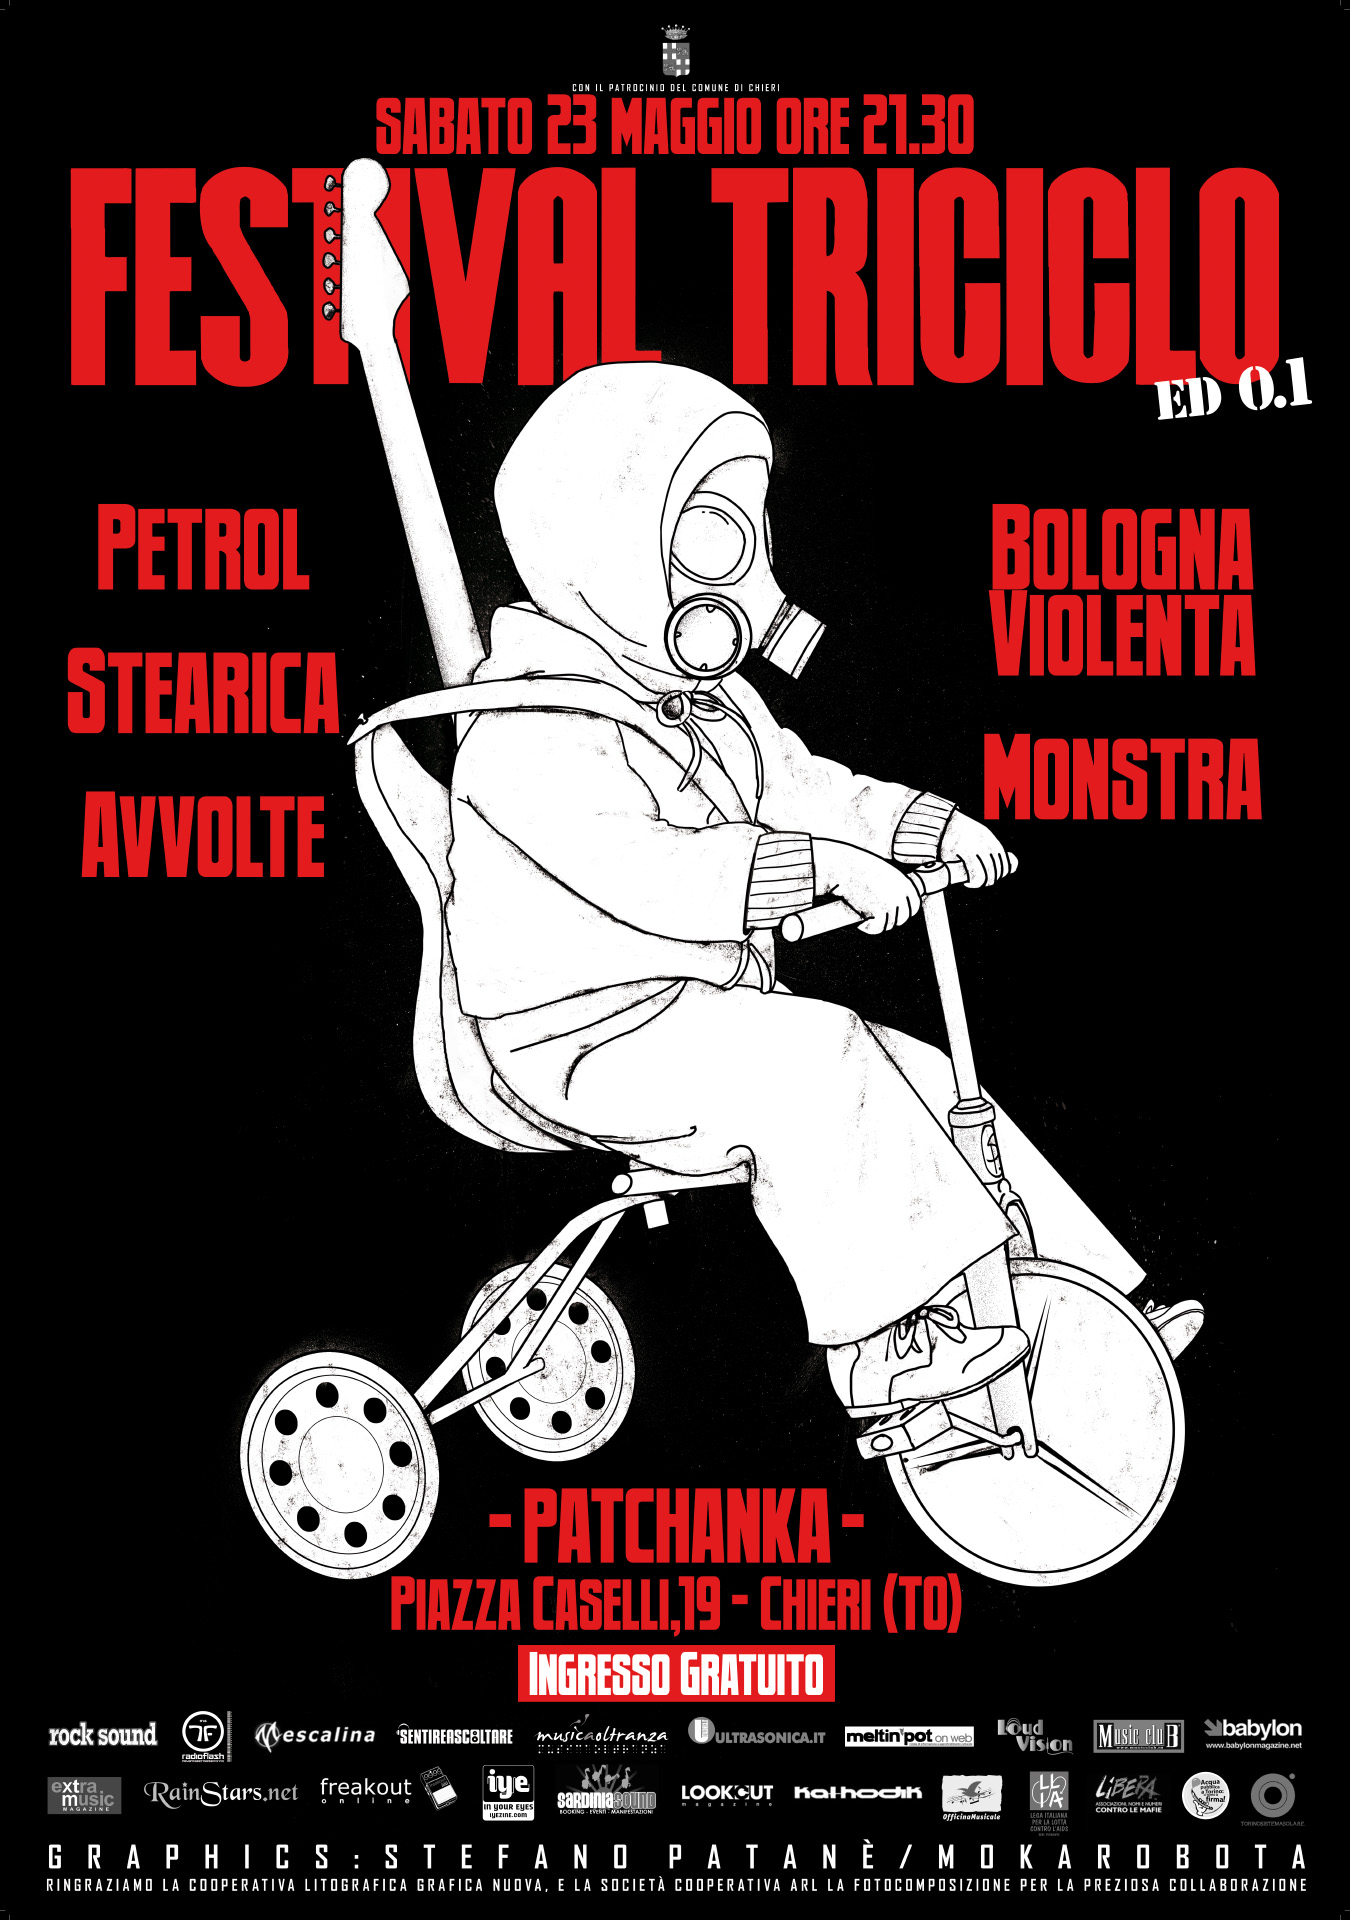 Festival Triciclo – Poster